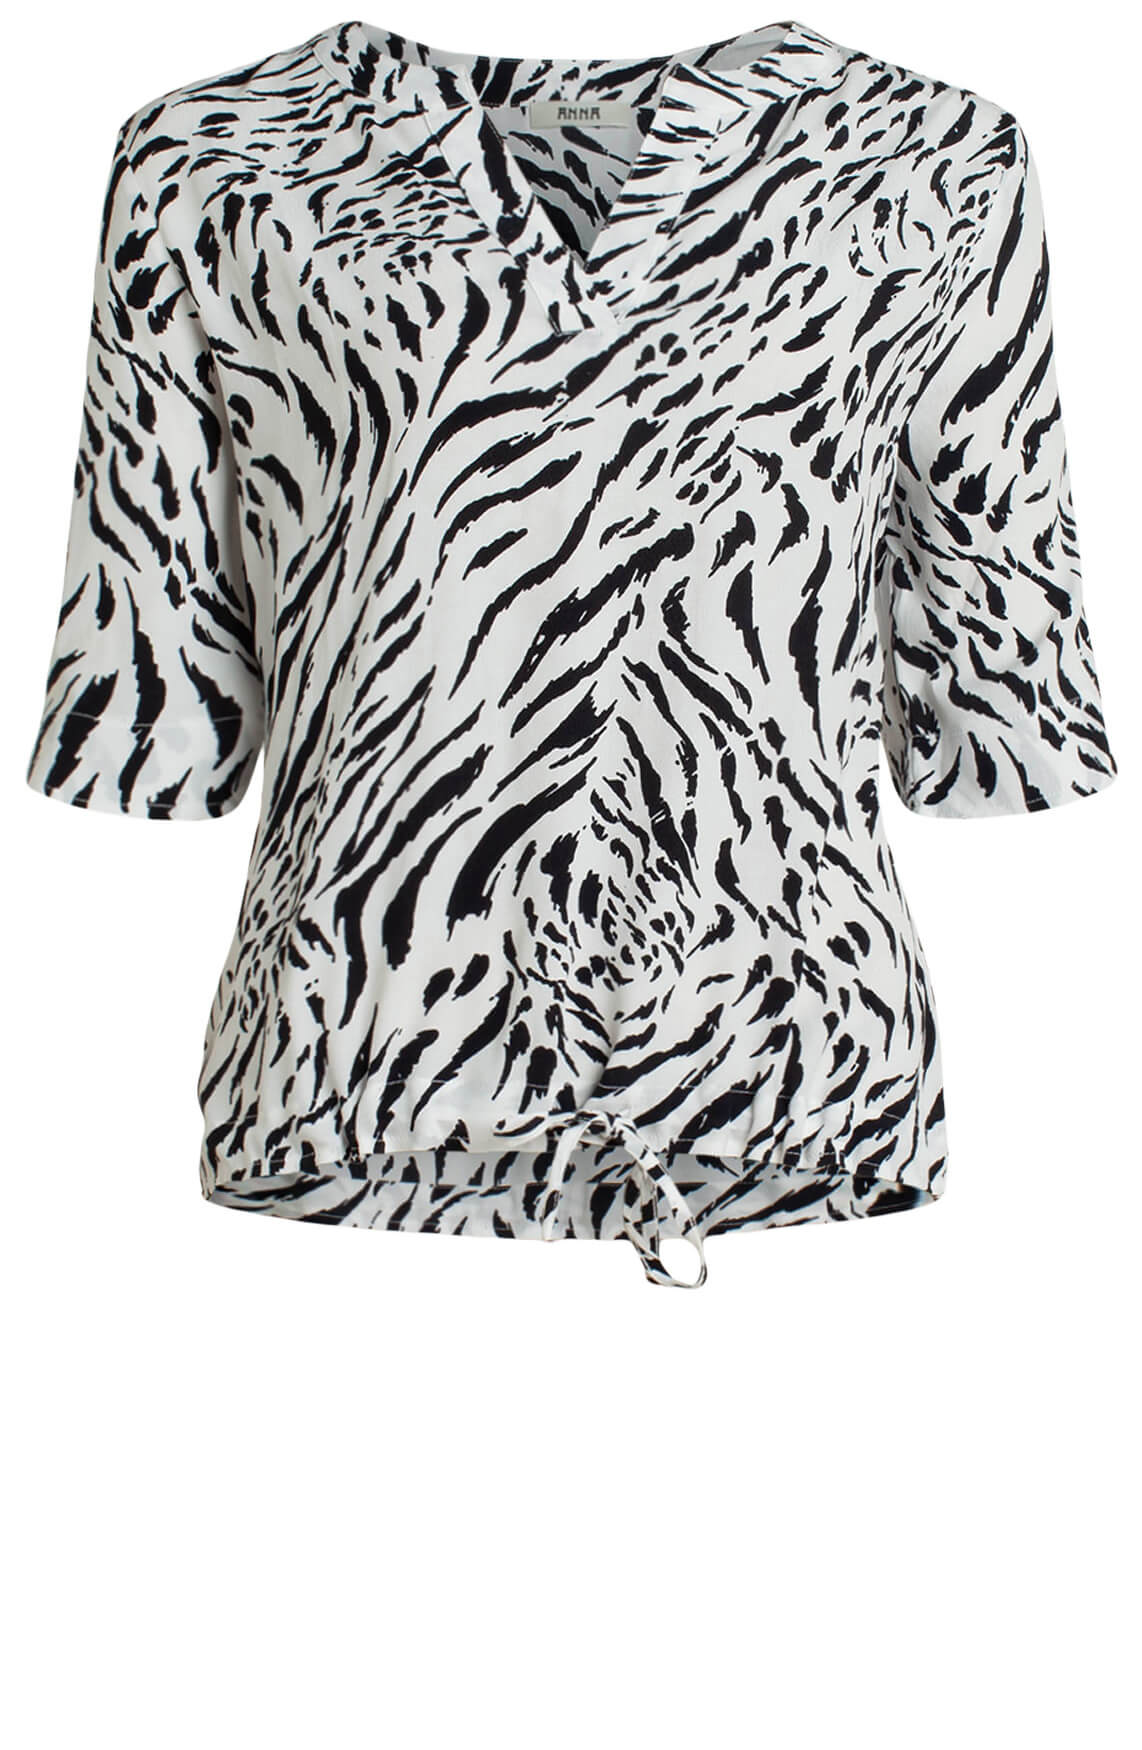 Anna Dames Blouse met zebraprint wit